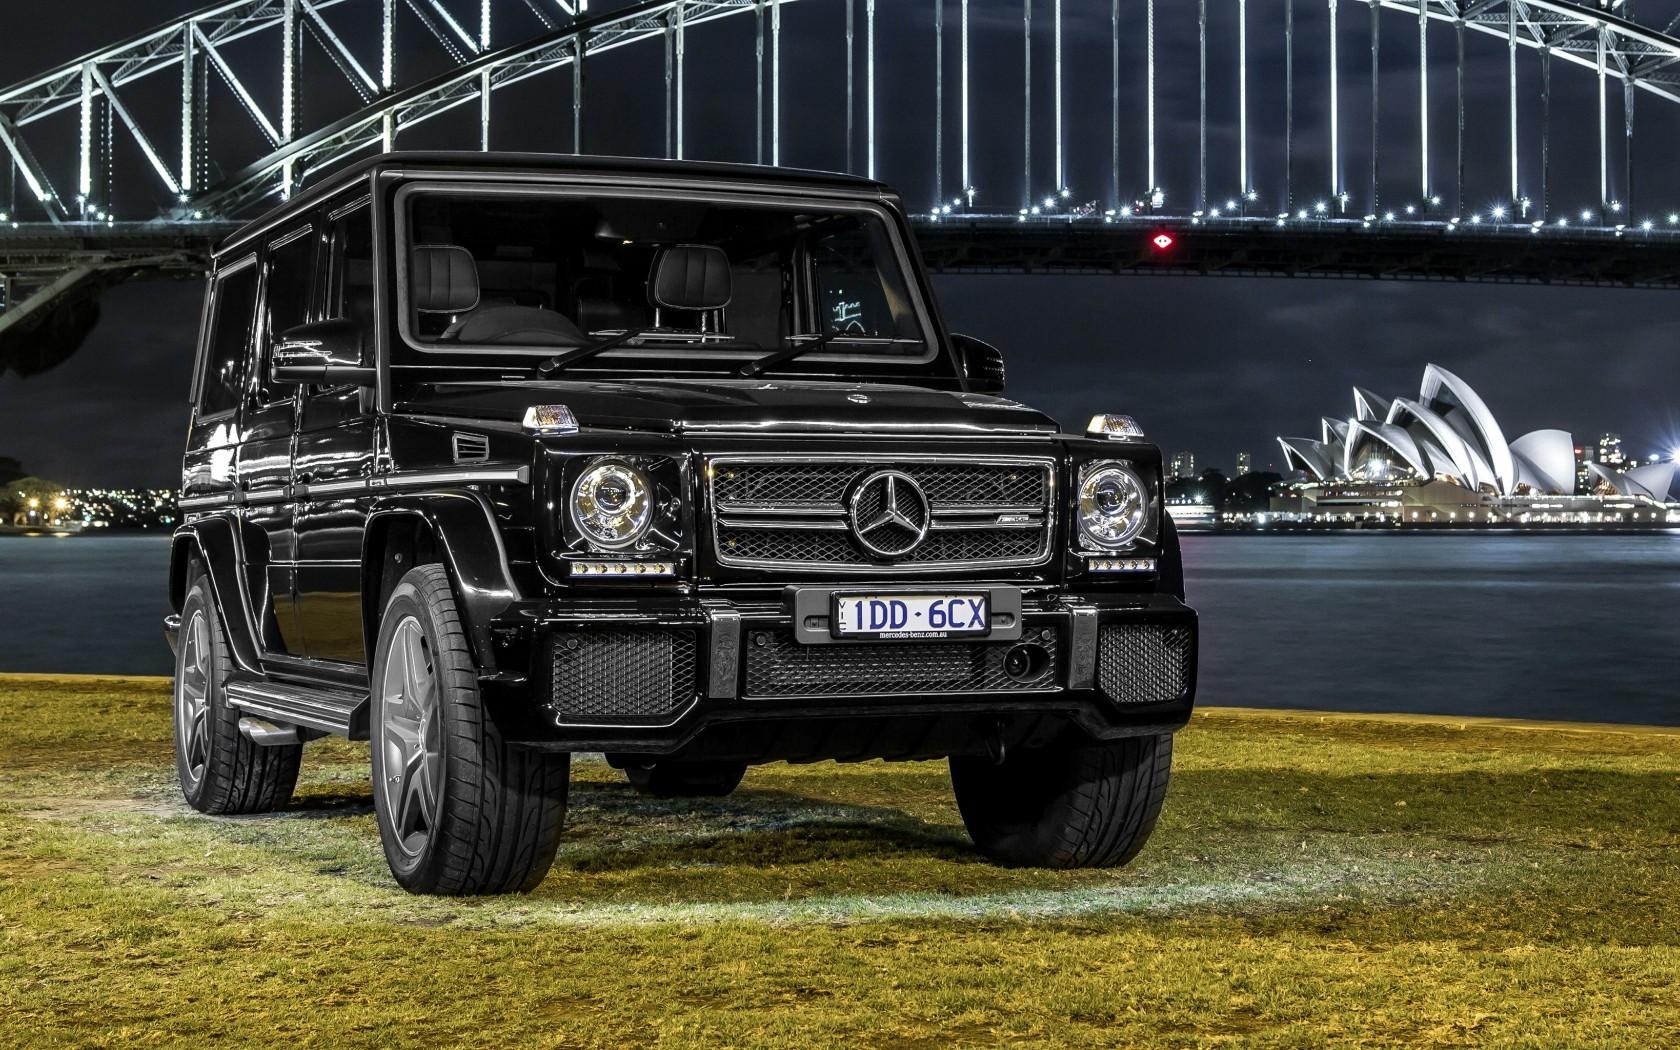 Fond D Ecran Amg Mercedes Benz Classe G W463 1680x1050 Wallup 996719 Fond D Ecran Wallhere